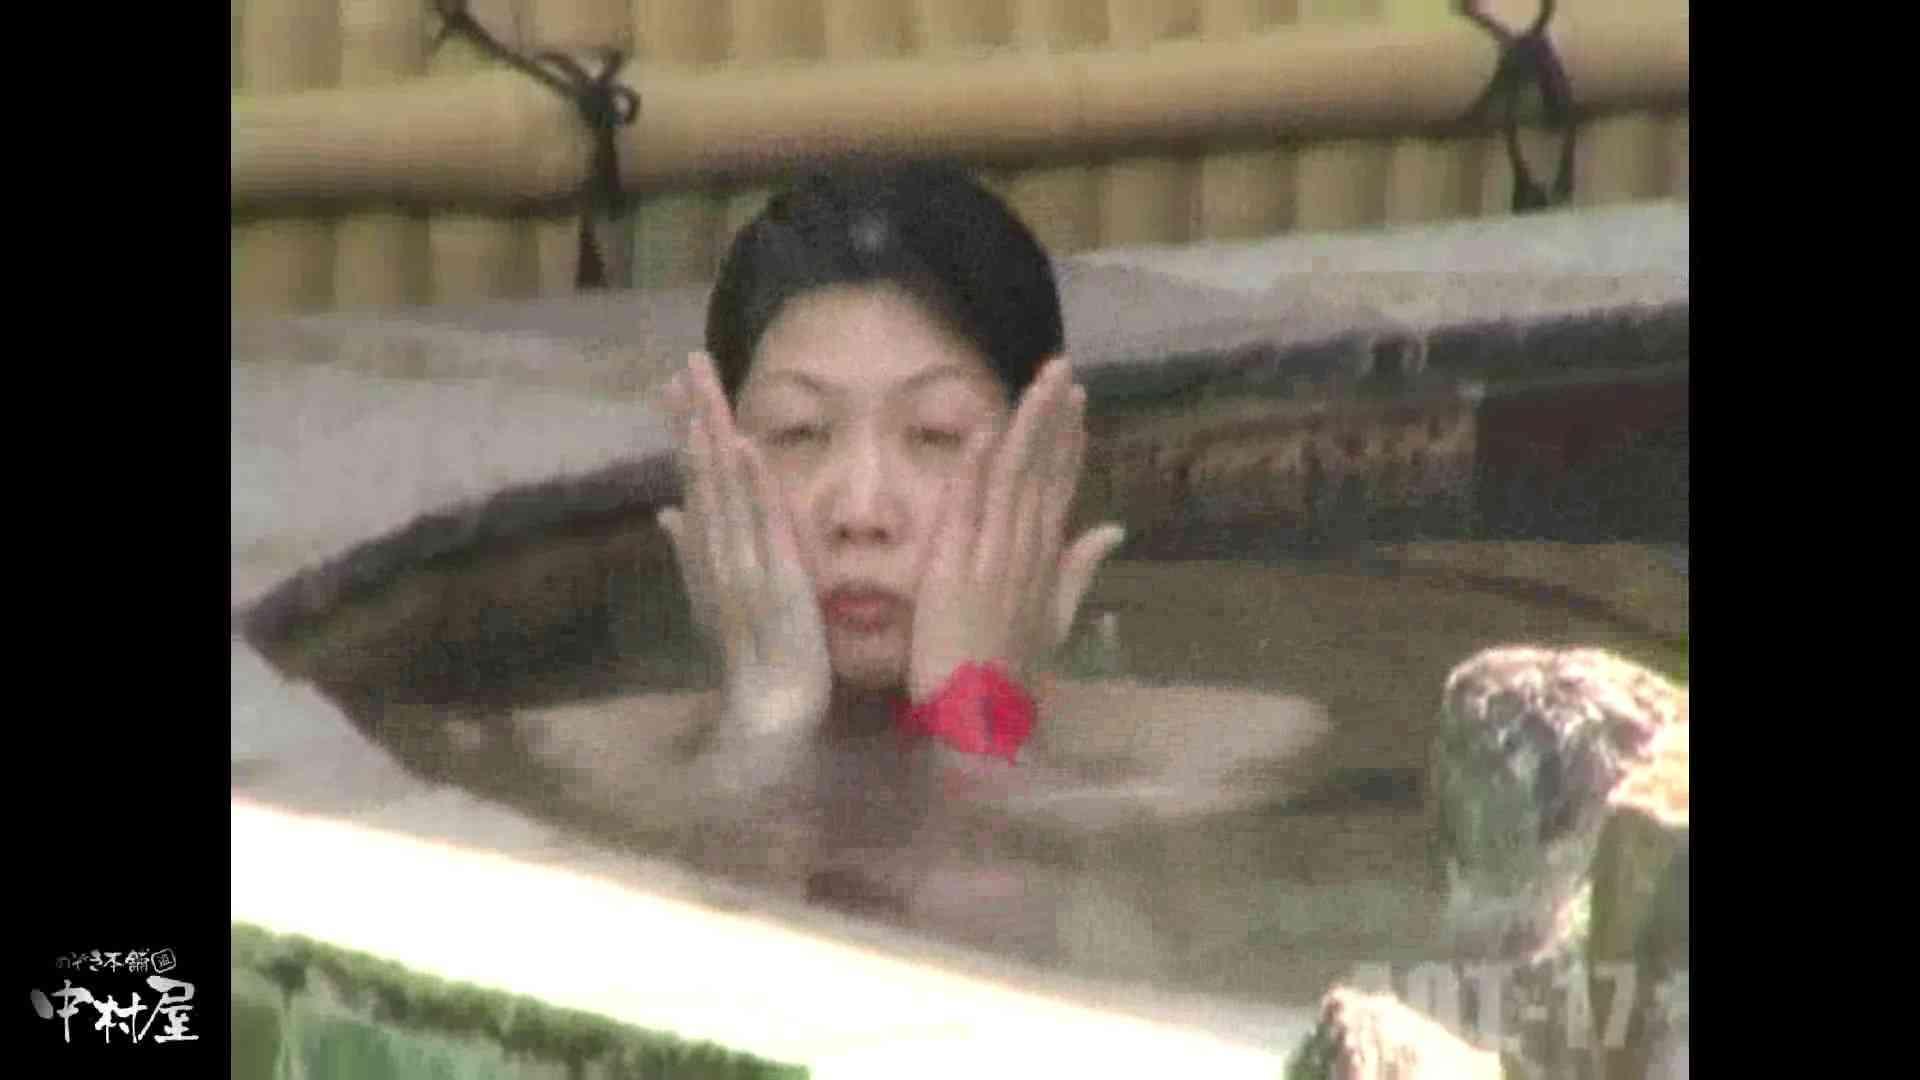 Aquaな露天風呂Vol.881潜入盗撮露天風呂十七判湯 其の三 潜入 のぞき動画画像 72画像 3